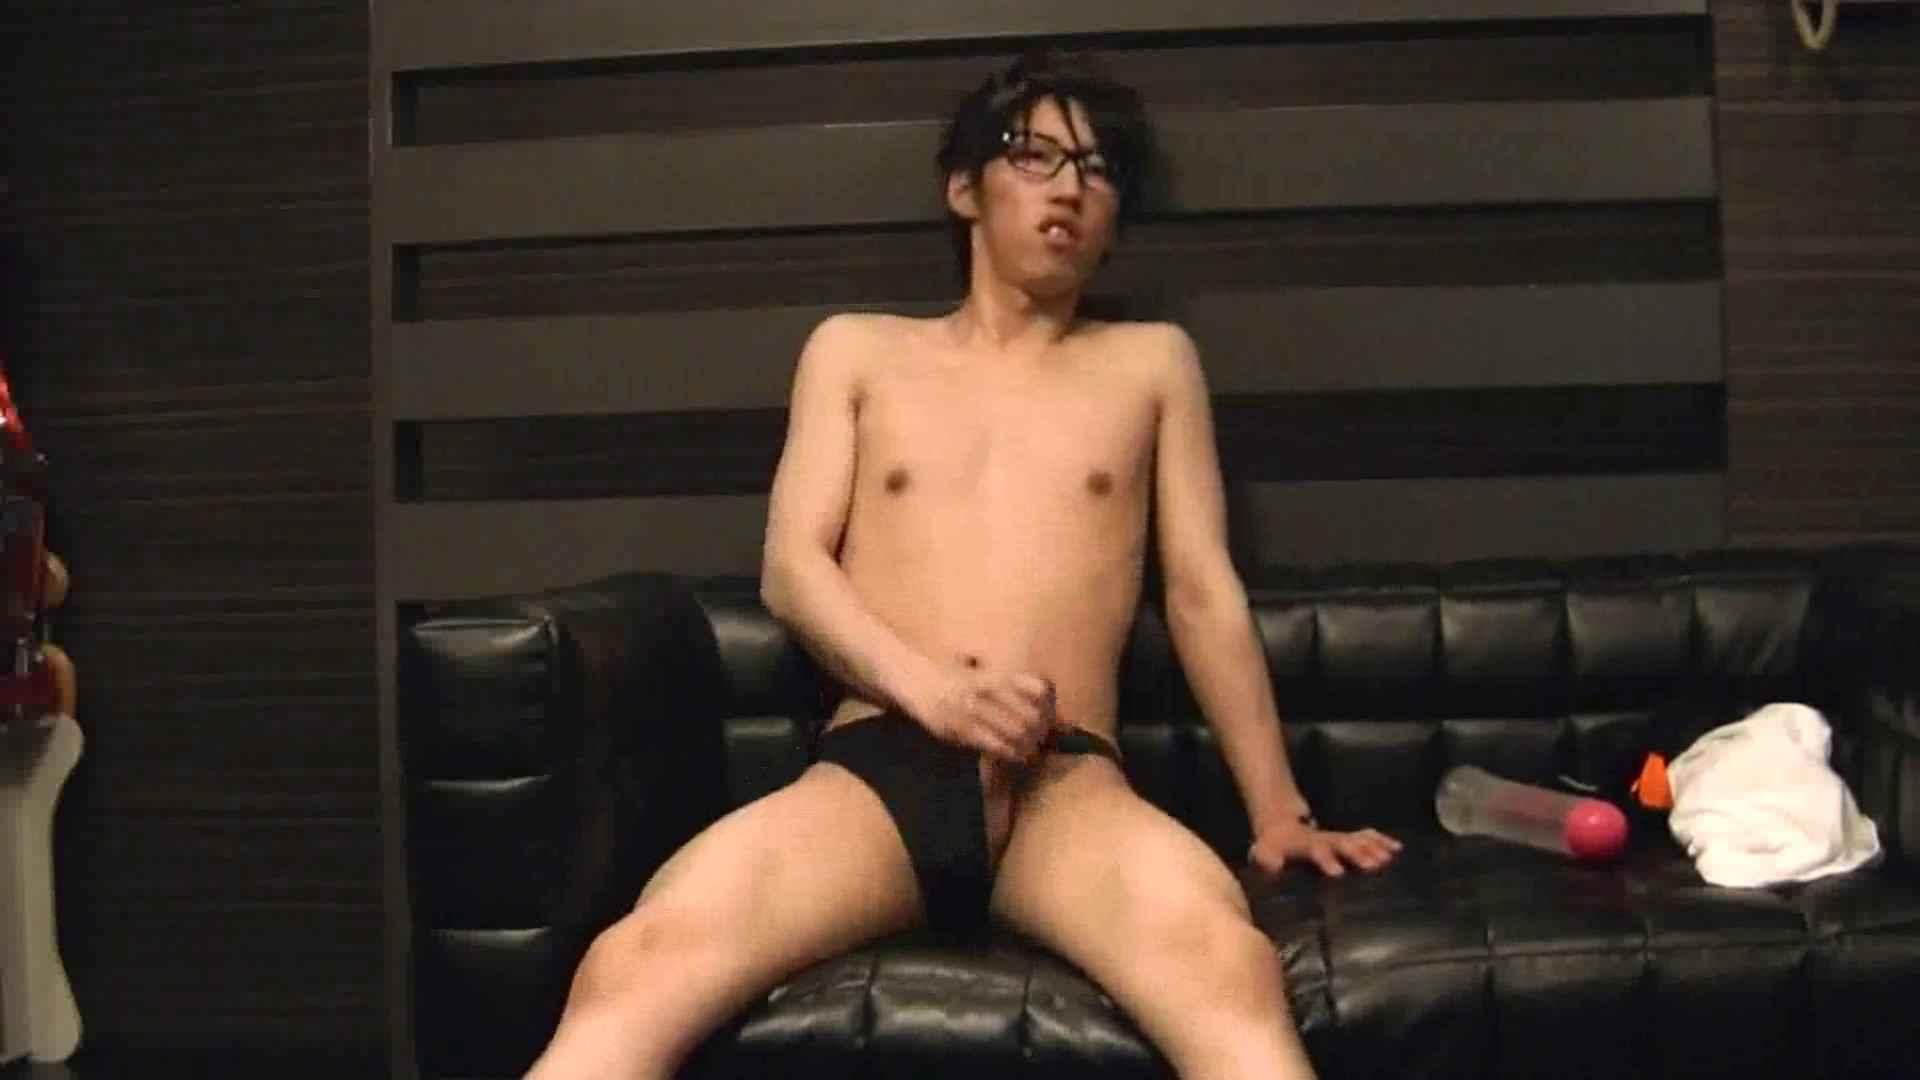 ONA見せカーニバル!! Vol3 男  93pic 63